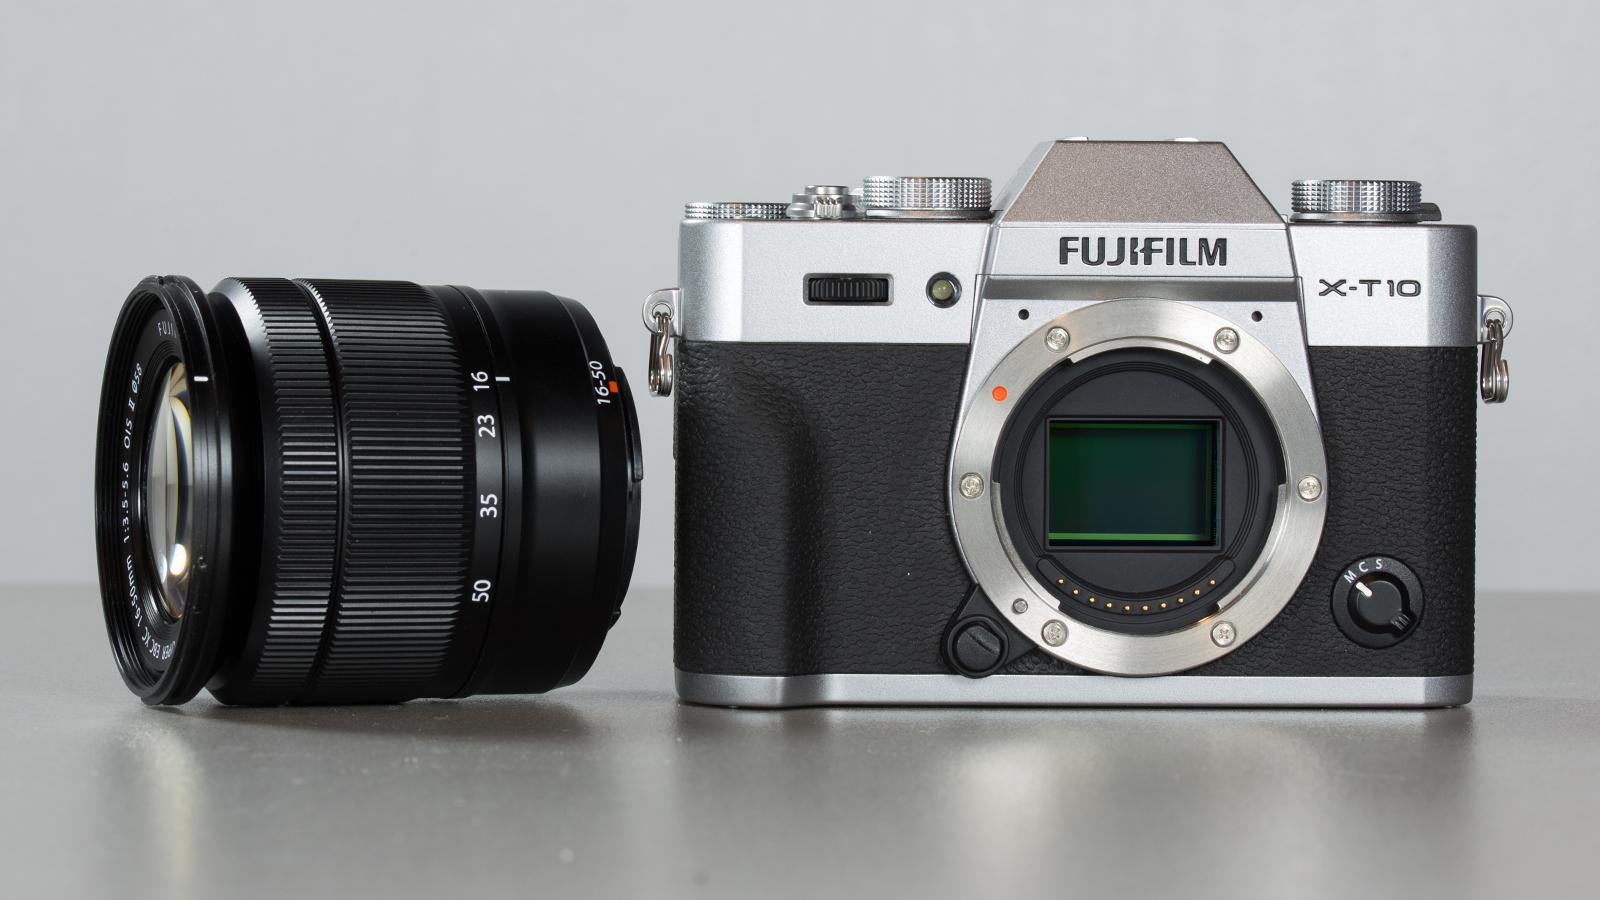 Fujifilm-X-T10-DT-002-toruga